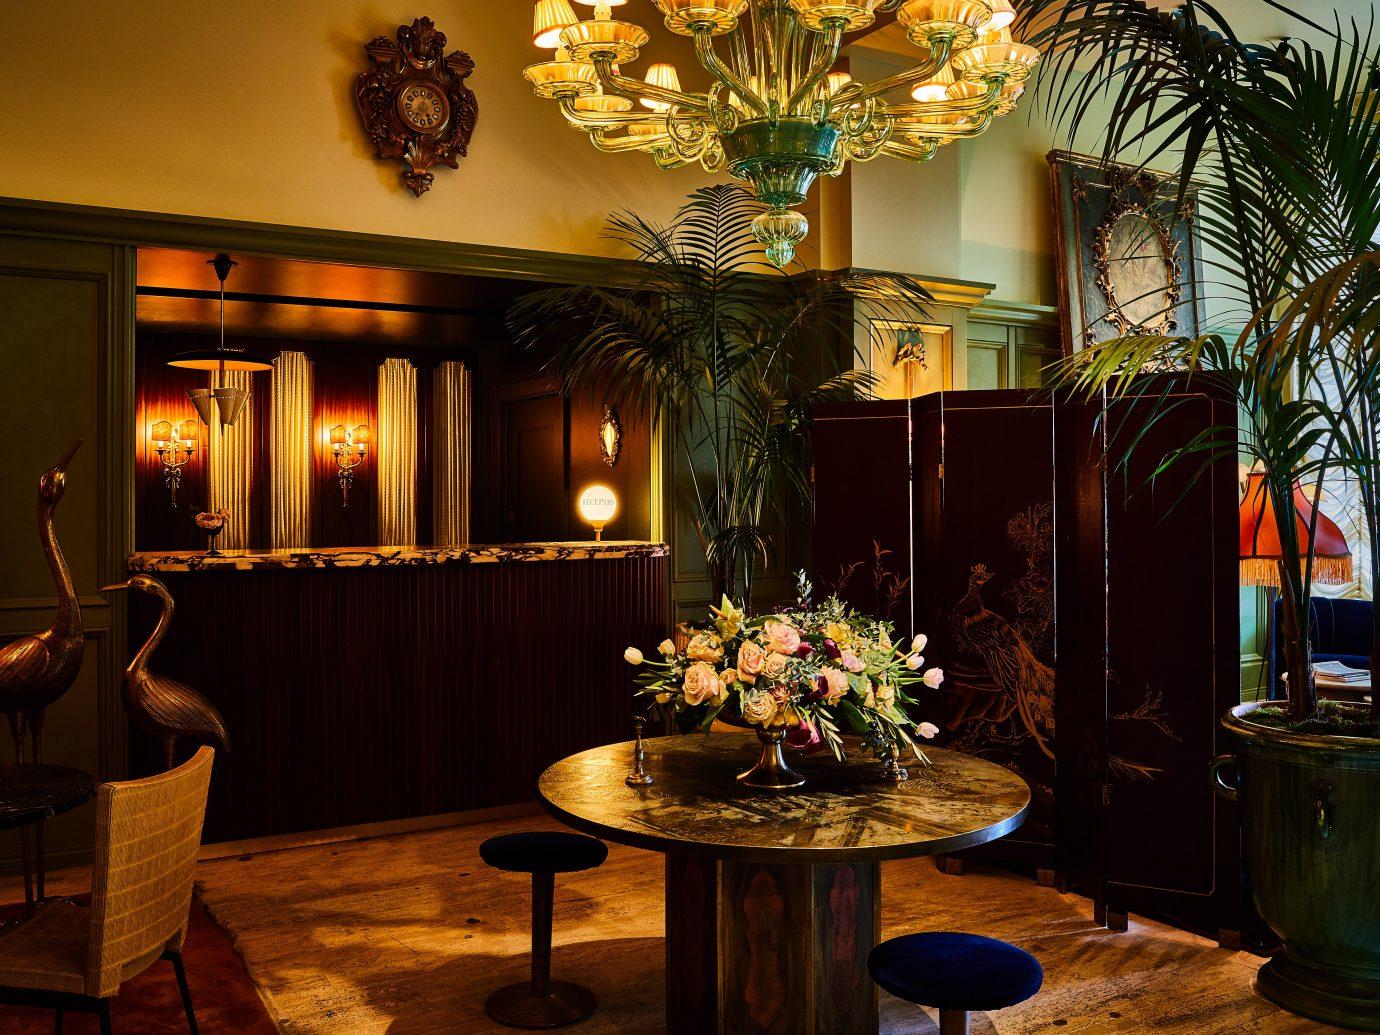 Reception desk at the Siren Hotel